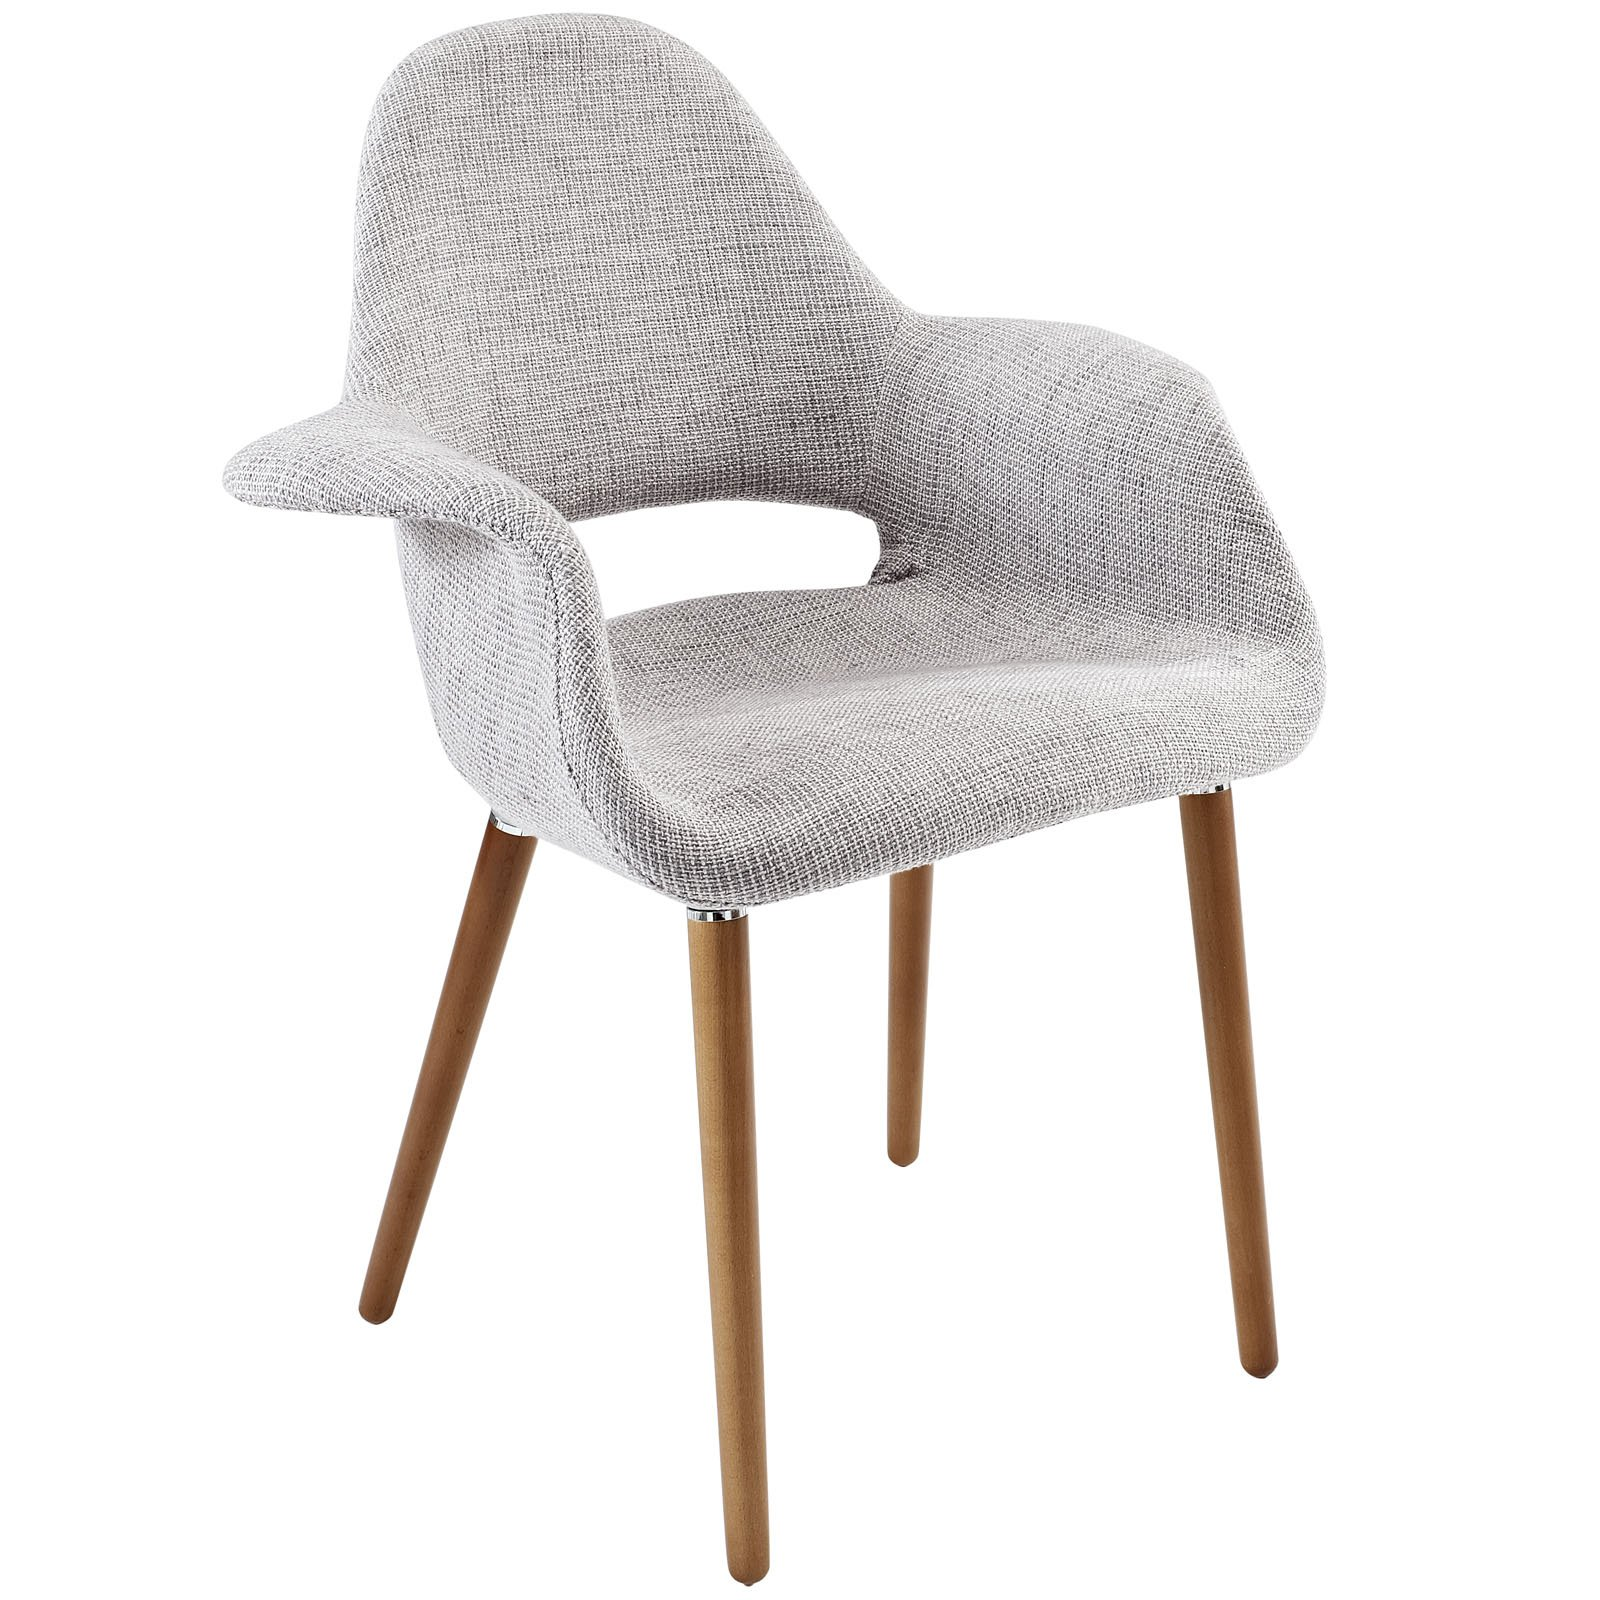 Enjoyable Details About Modway Aegis Dining Armchair Light Gray Short Links Chair Design For Home Short Linksinfo